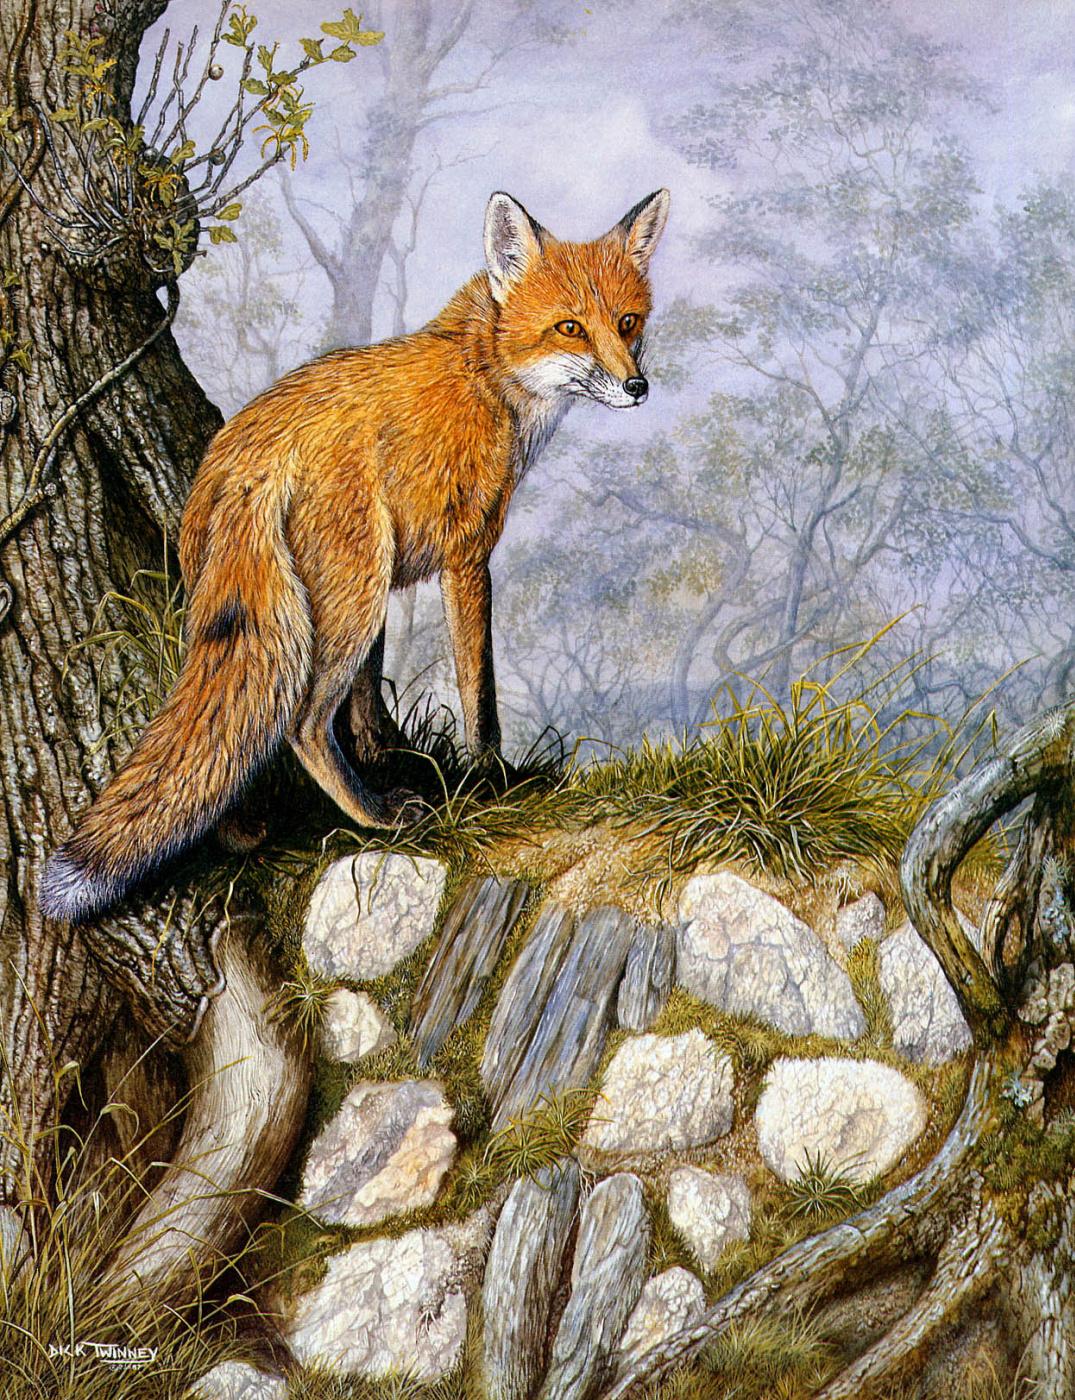 Dick Twinney. Nature 019